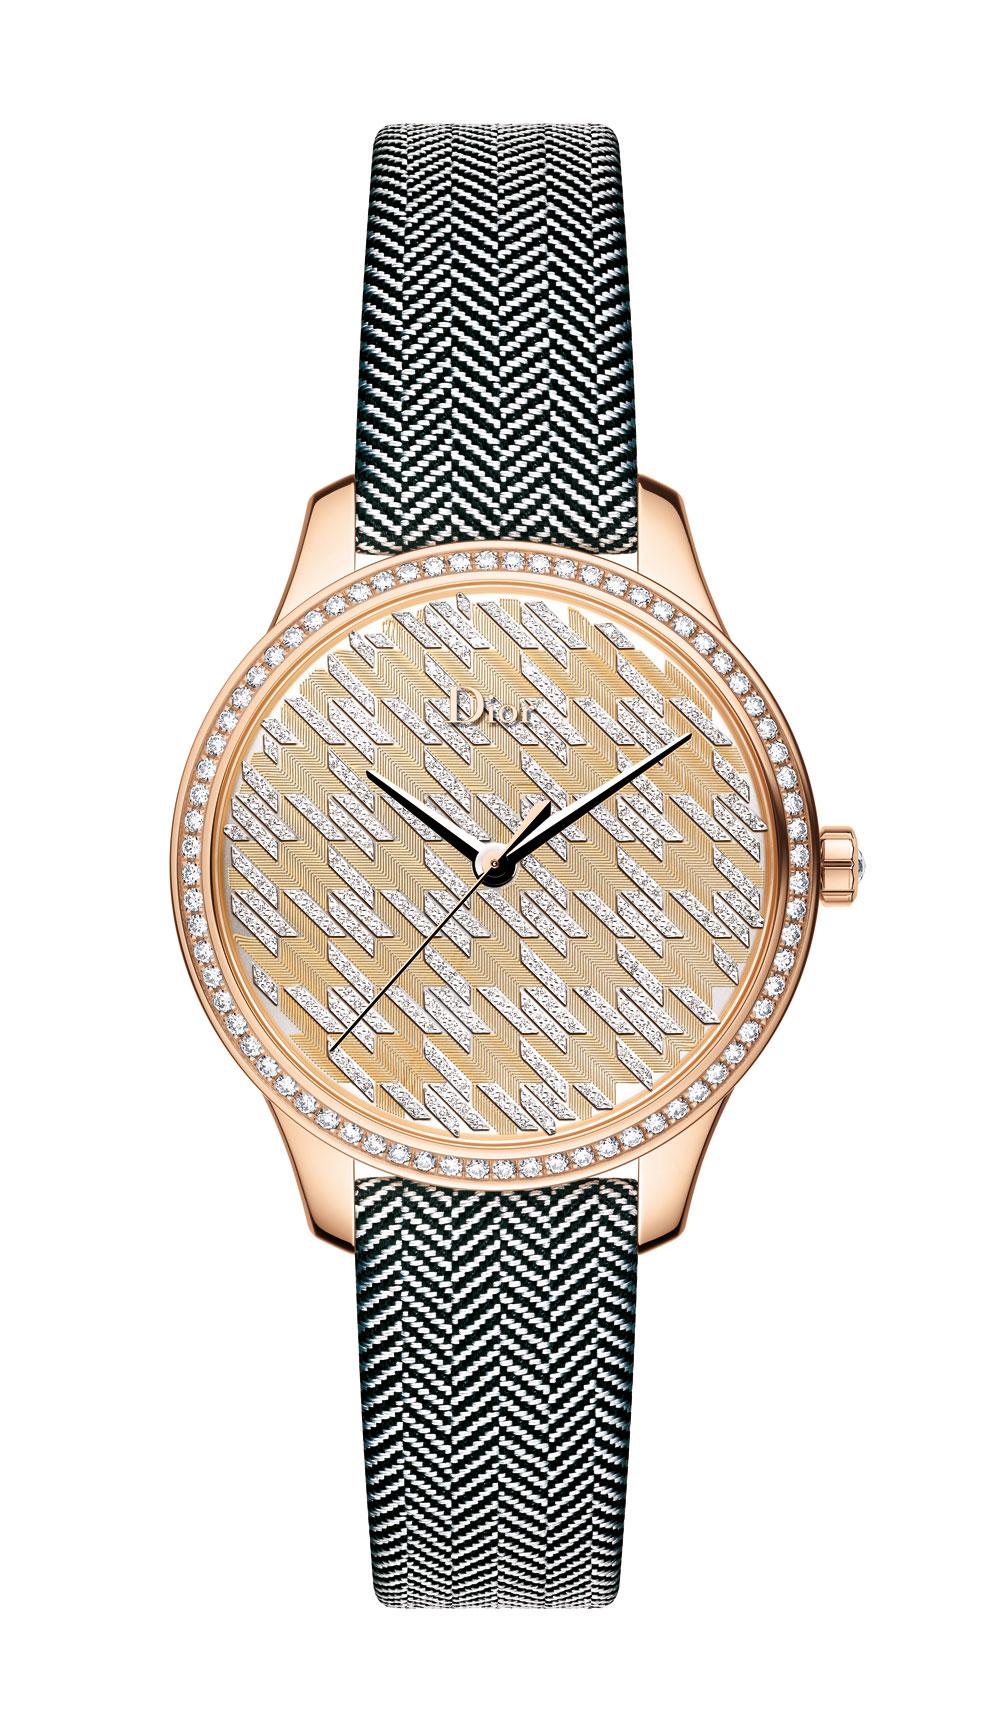 Reloj Dior VIII Mointaigne Tissage Precieux Pied-de-poule